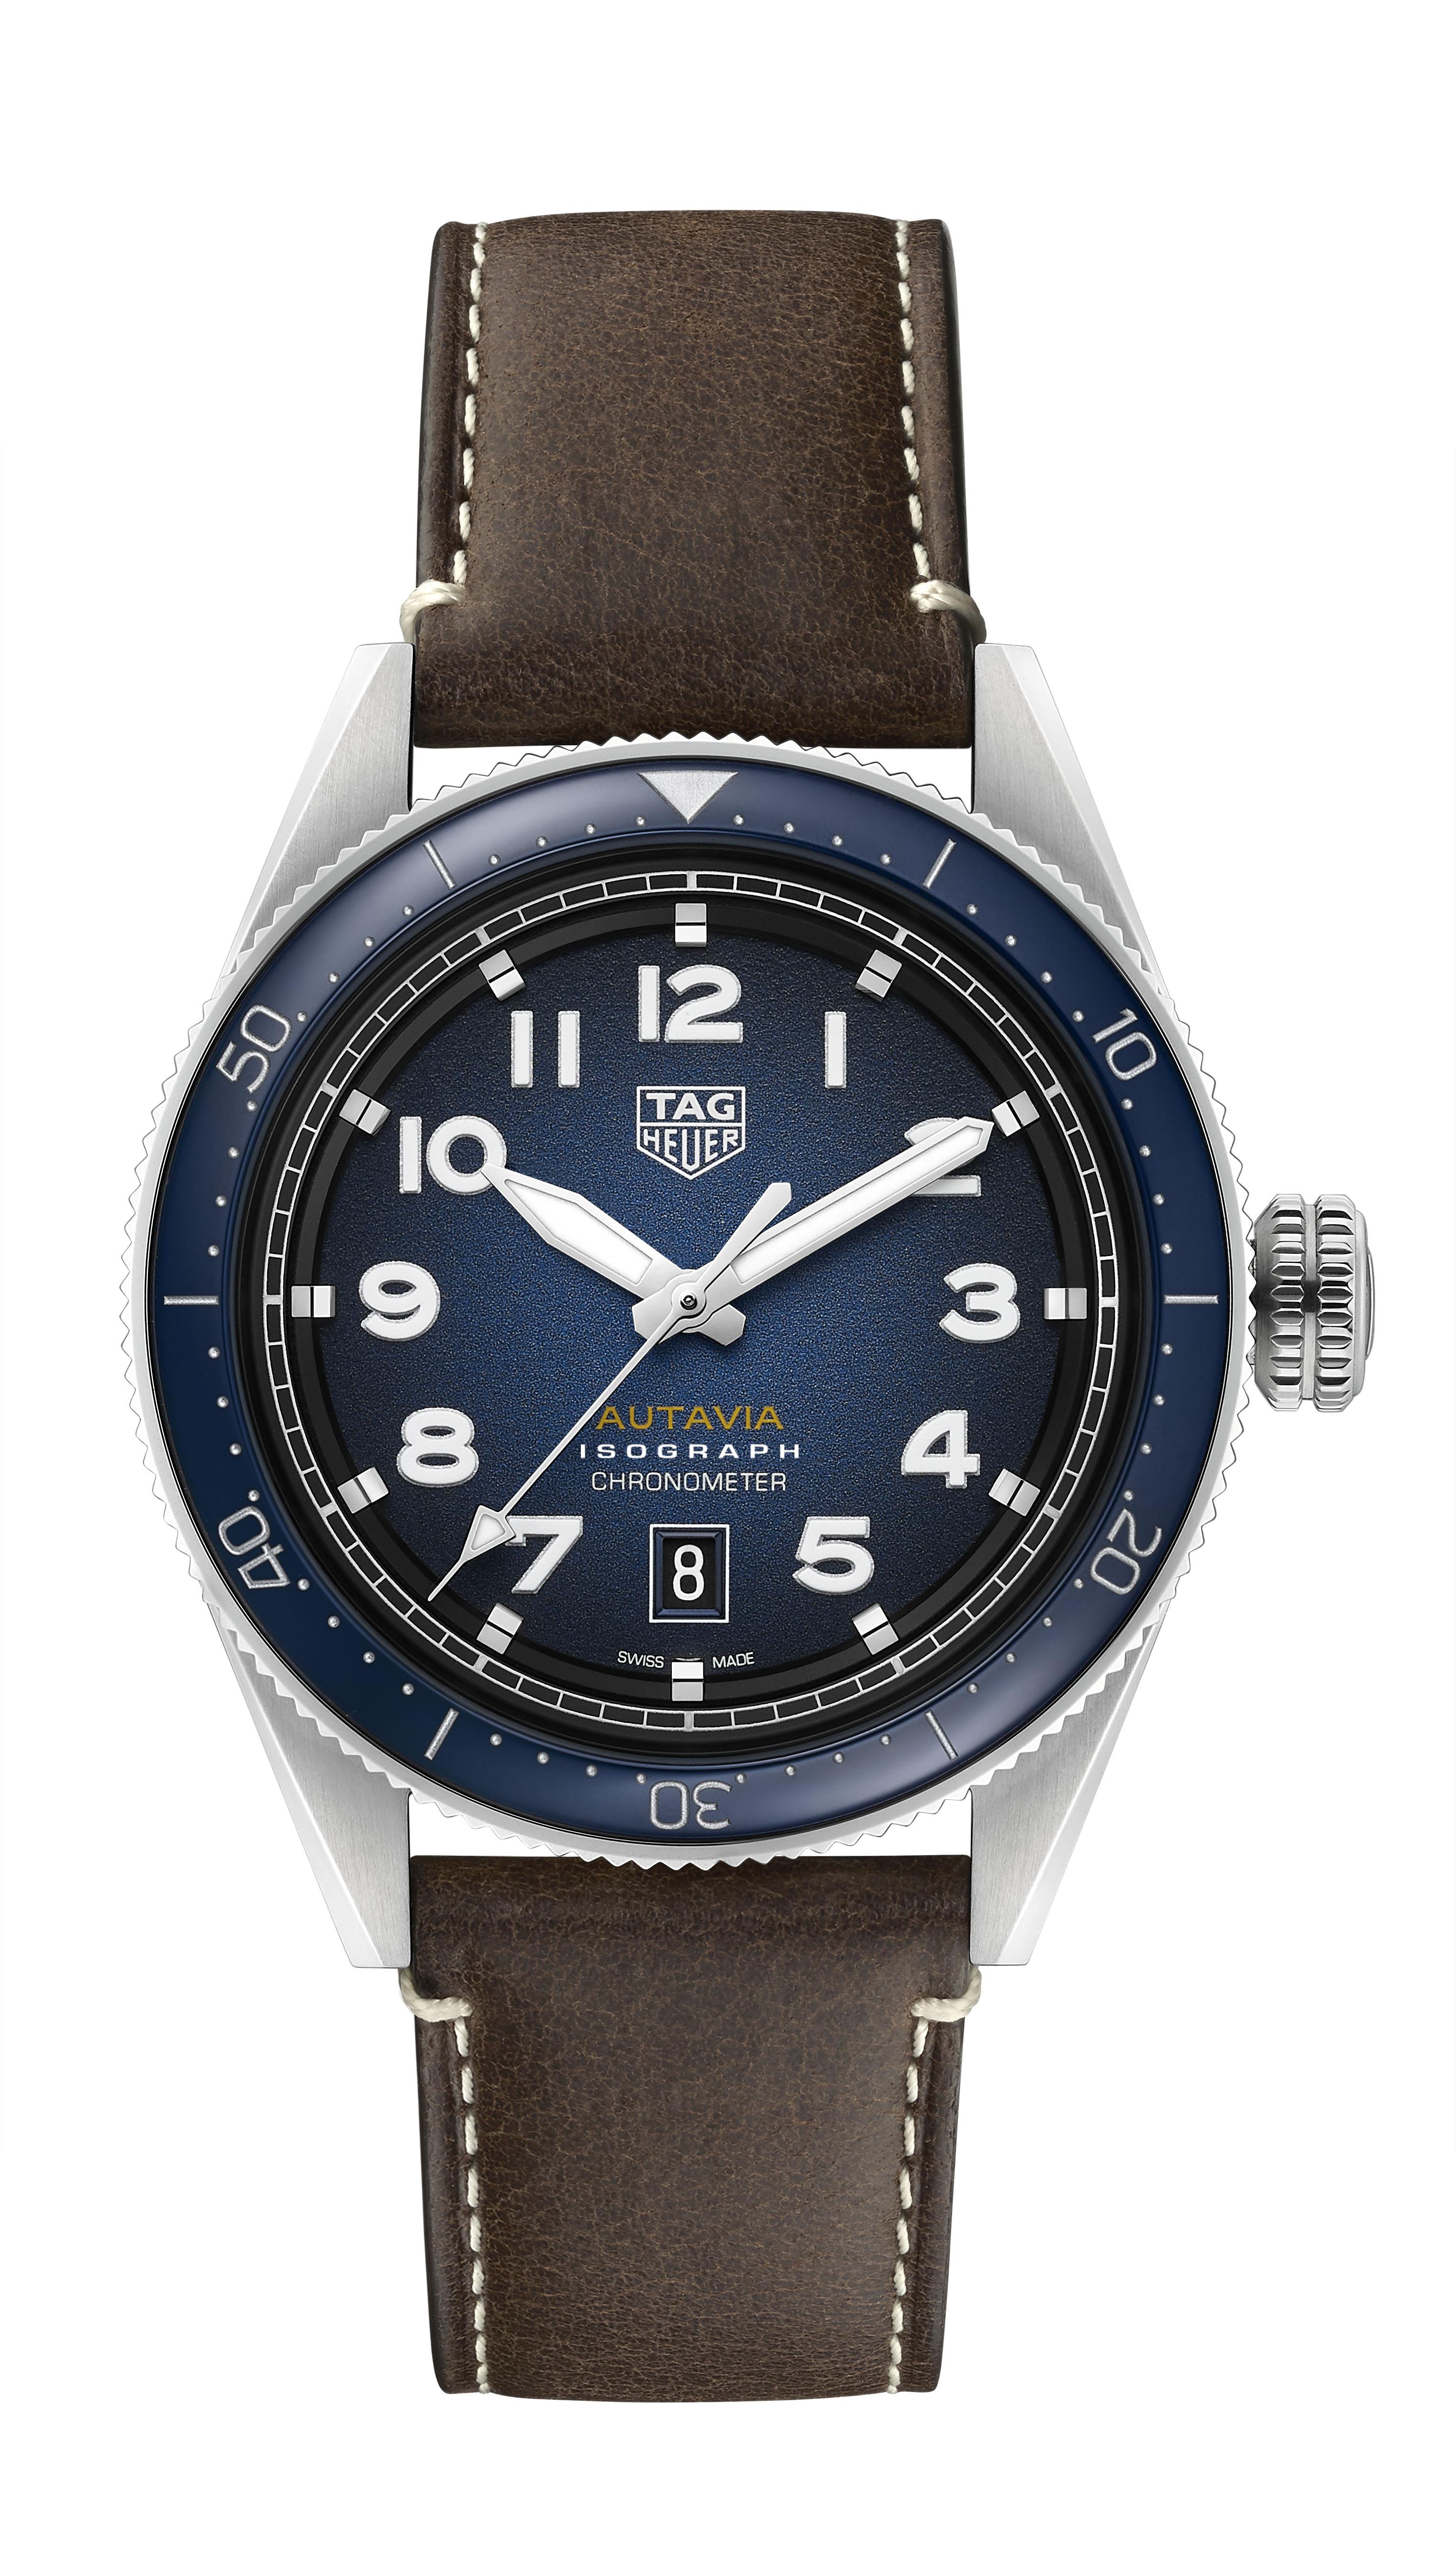 TAG Heuer Autavia Isograph Chronometer